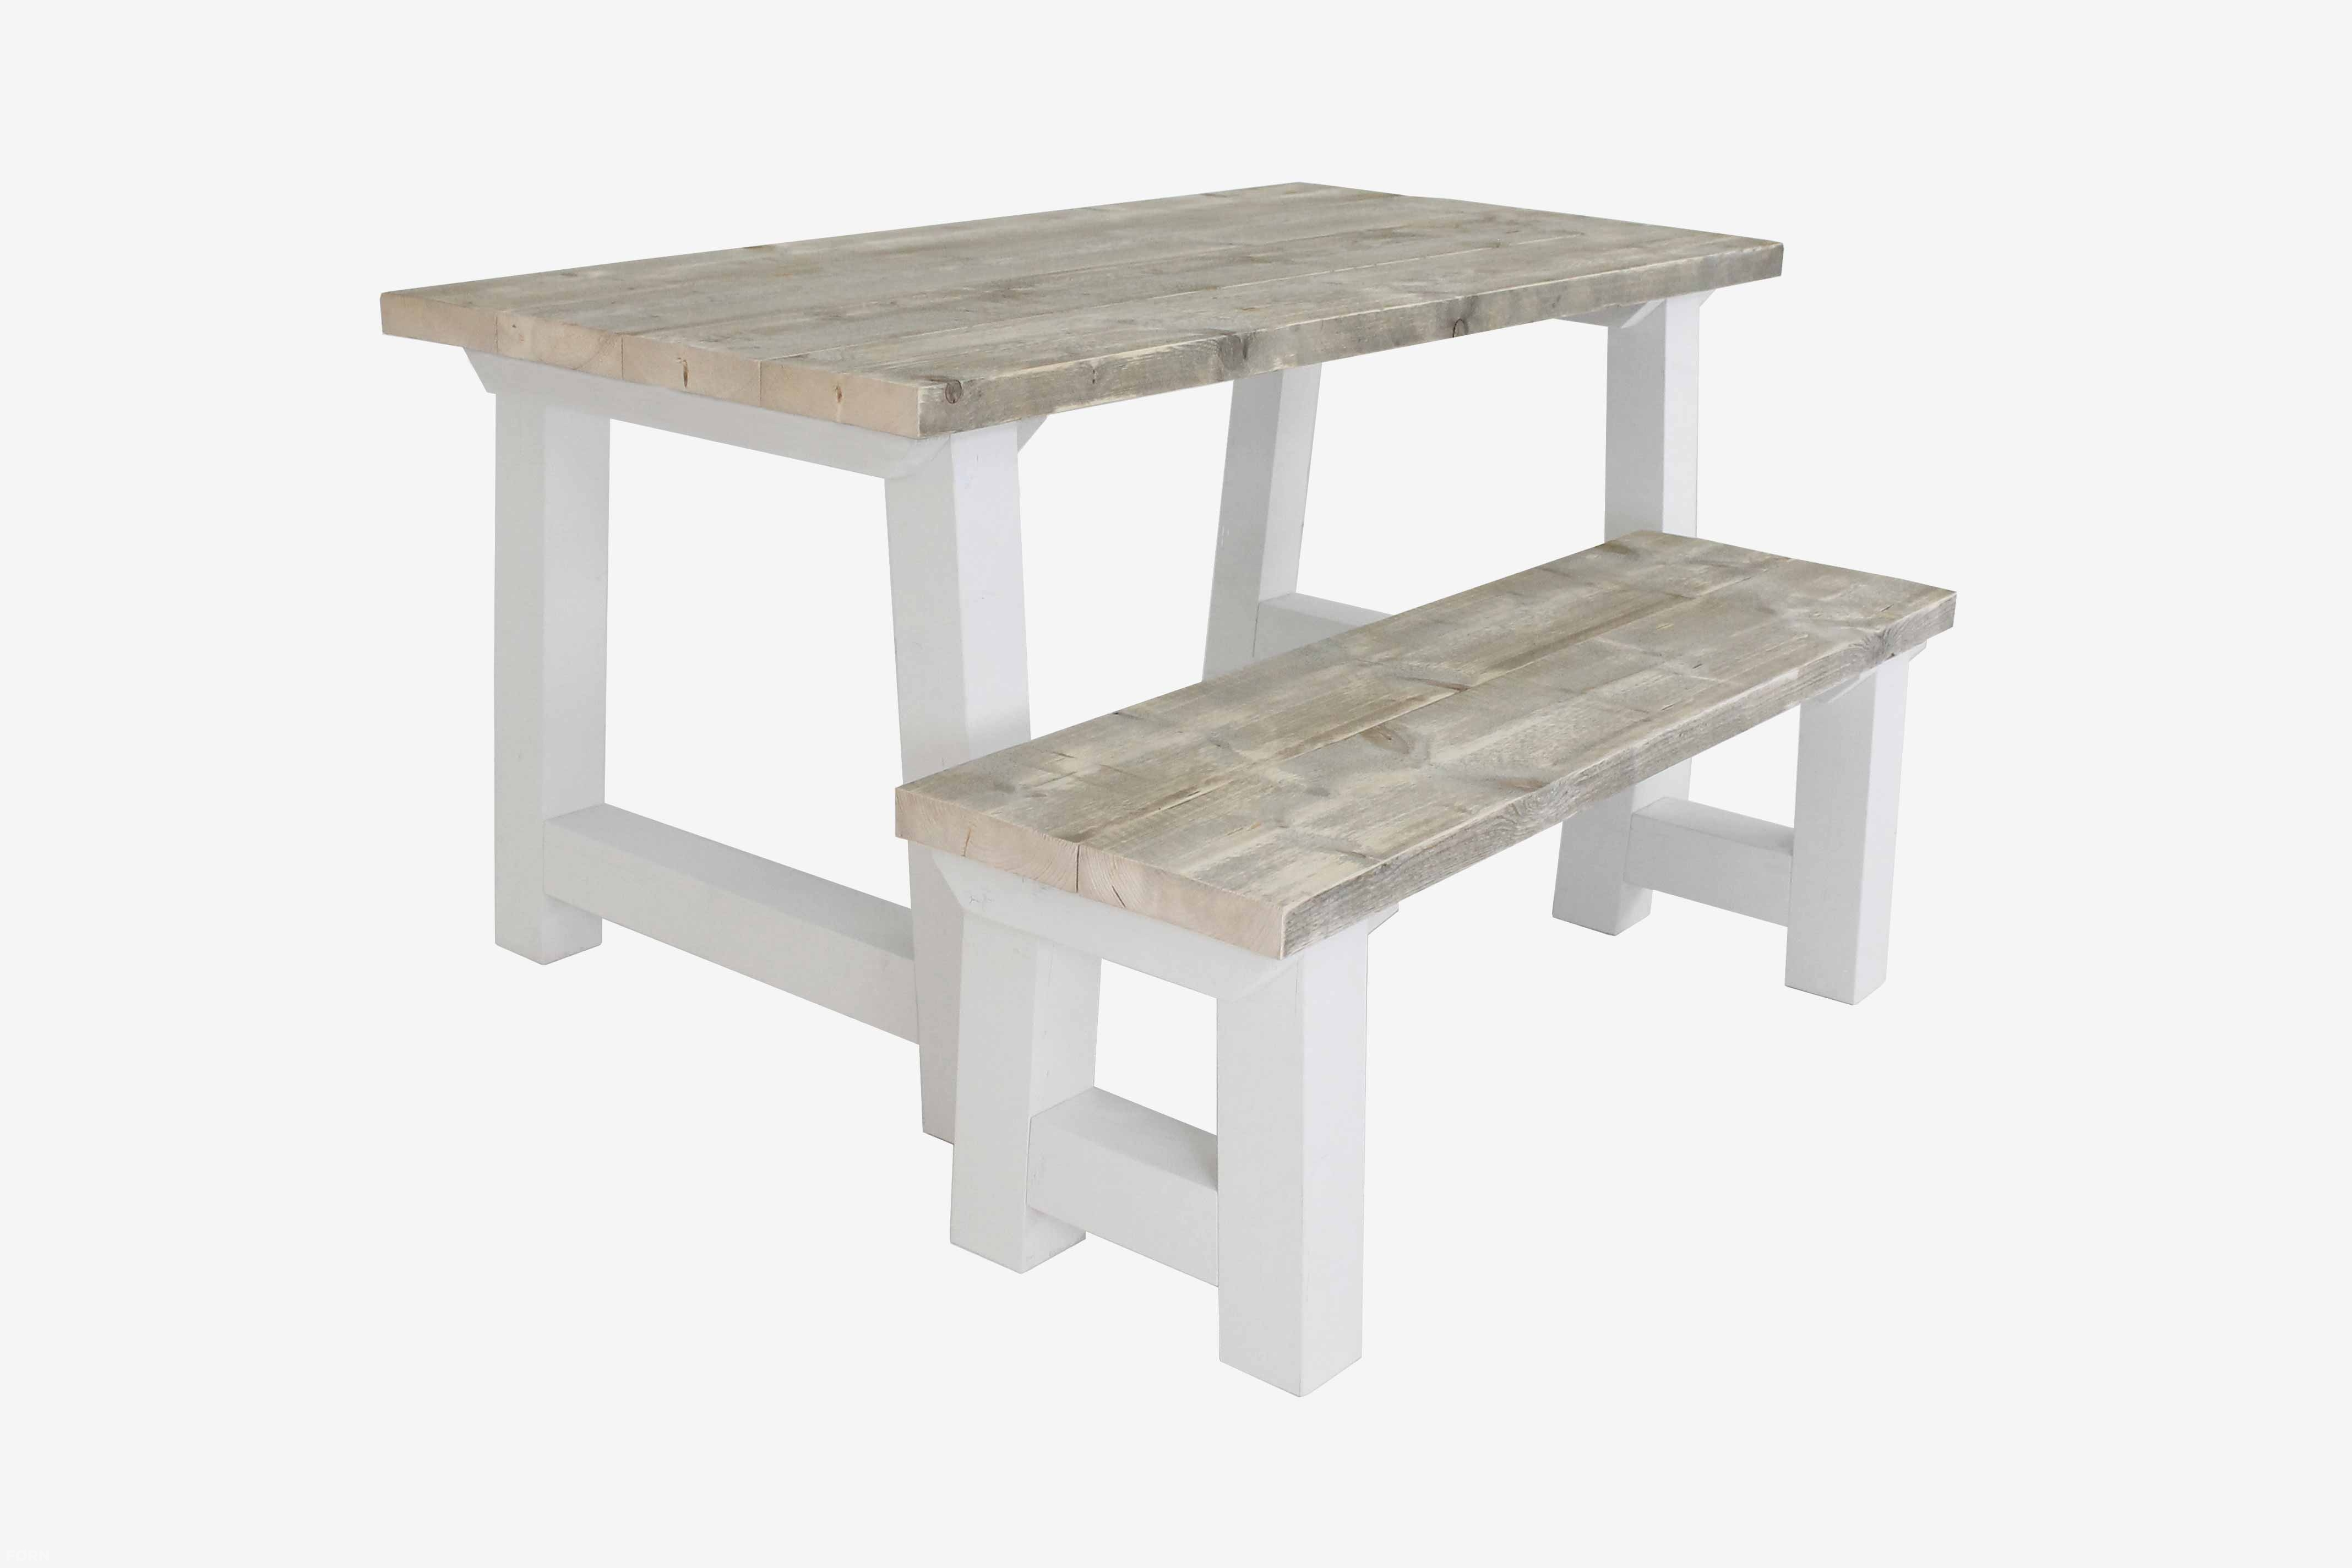 Landelijke houten tafel dikke planken steigerhouten tafel